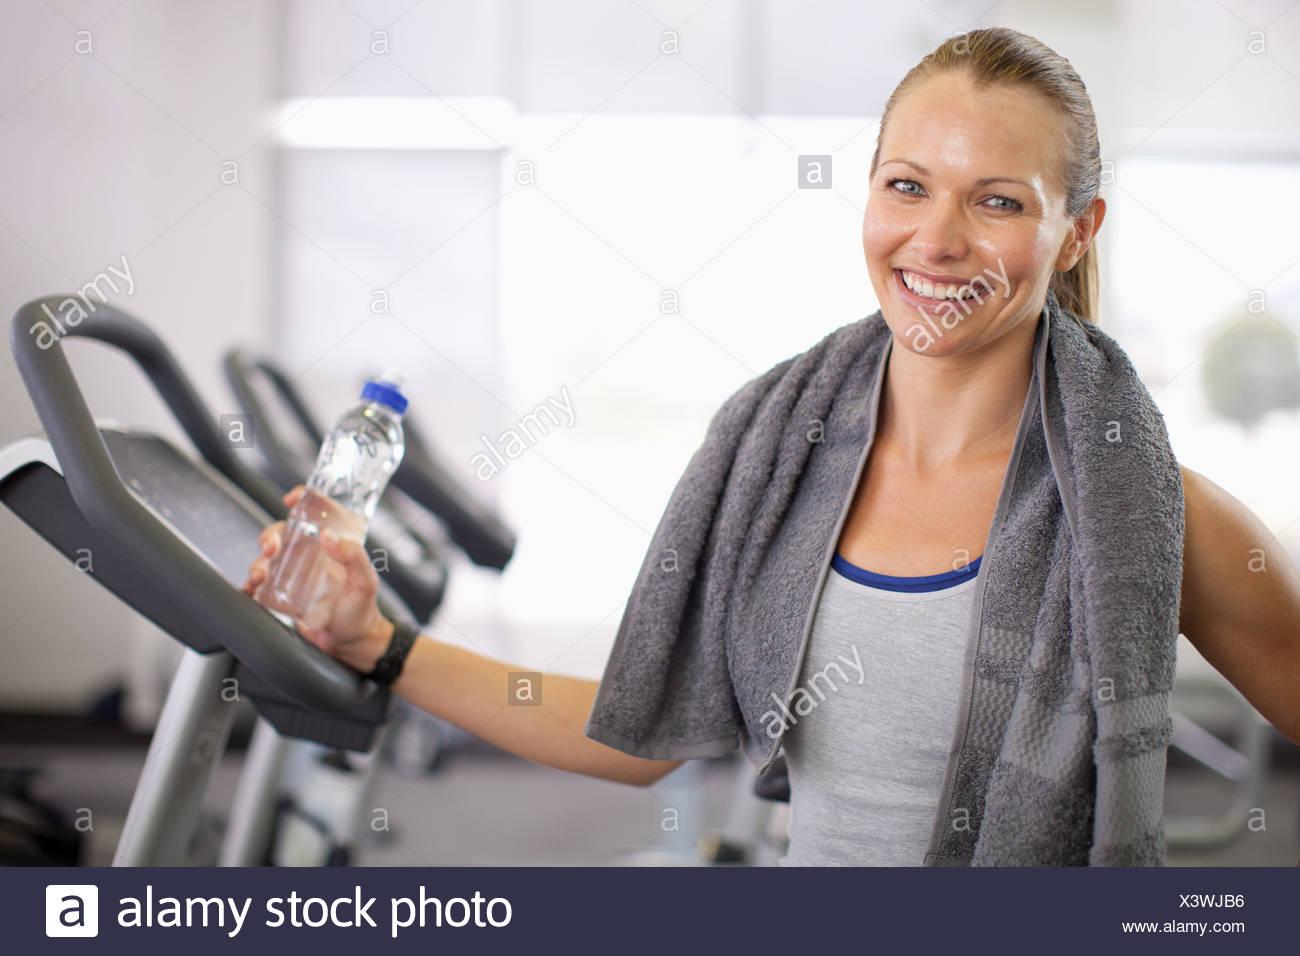 Frau mit Mineralwasser im Fitness-Studio Stockbild